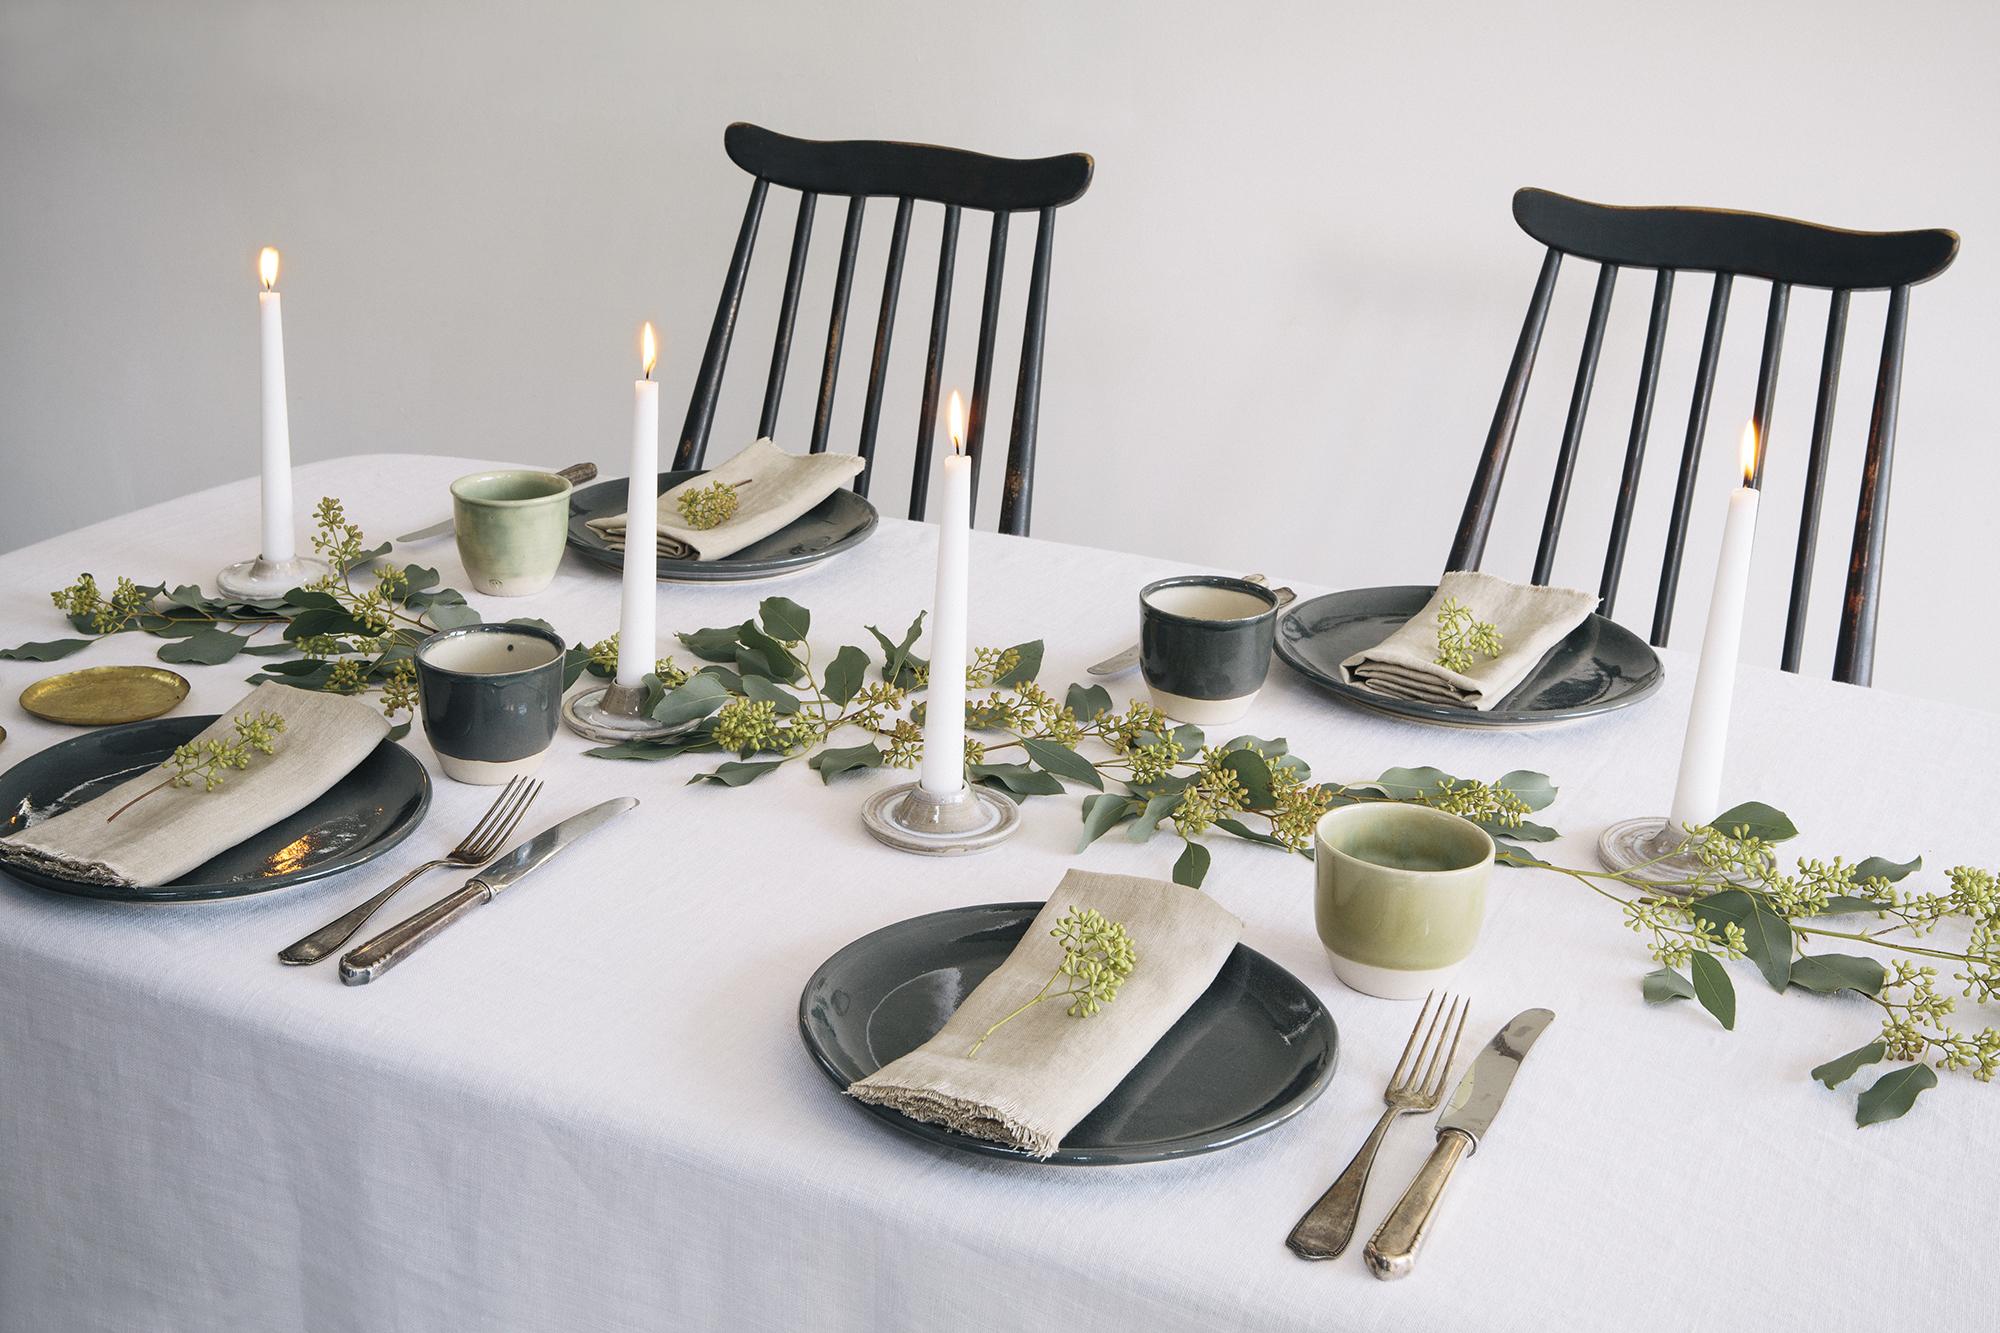 Aerende handmade social impact dinnerware 2.jpg